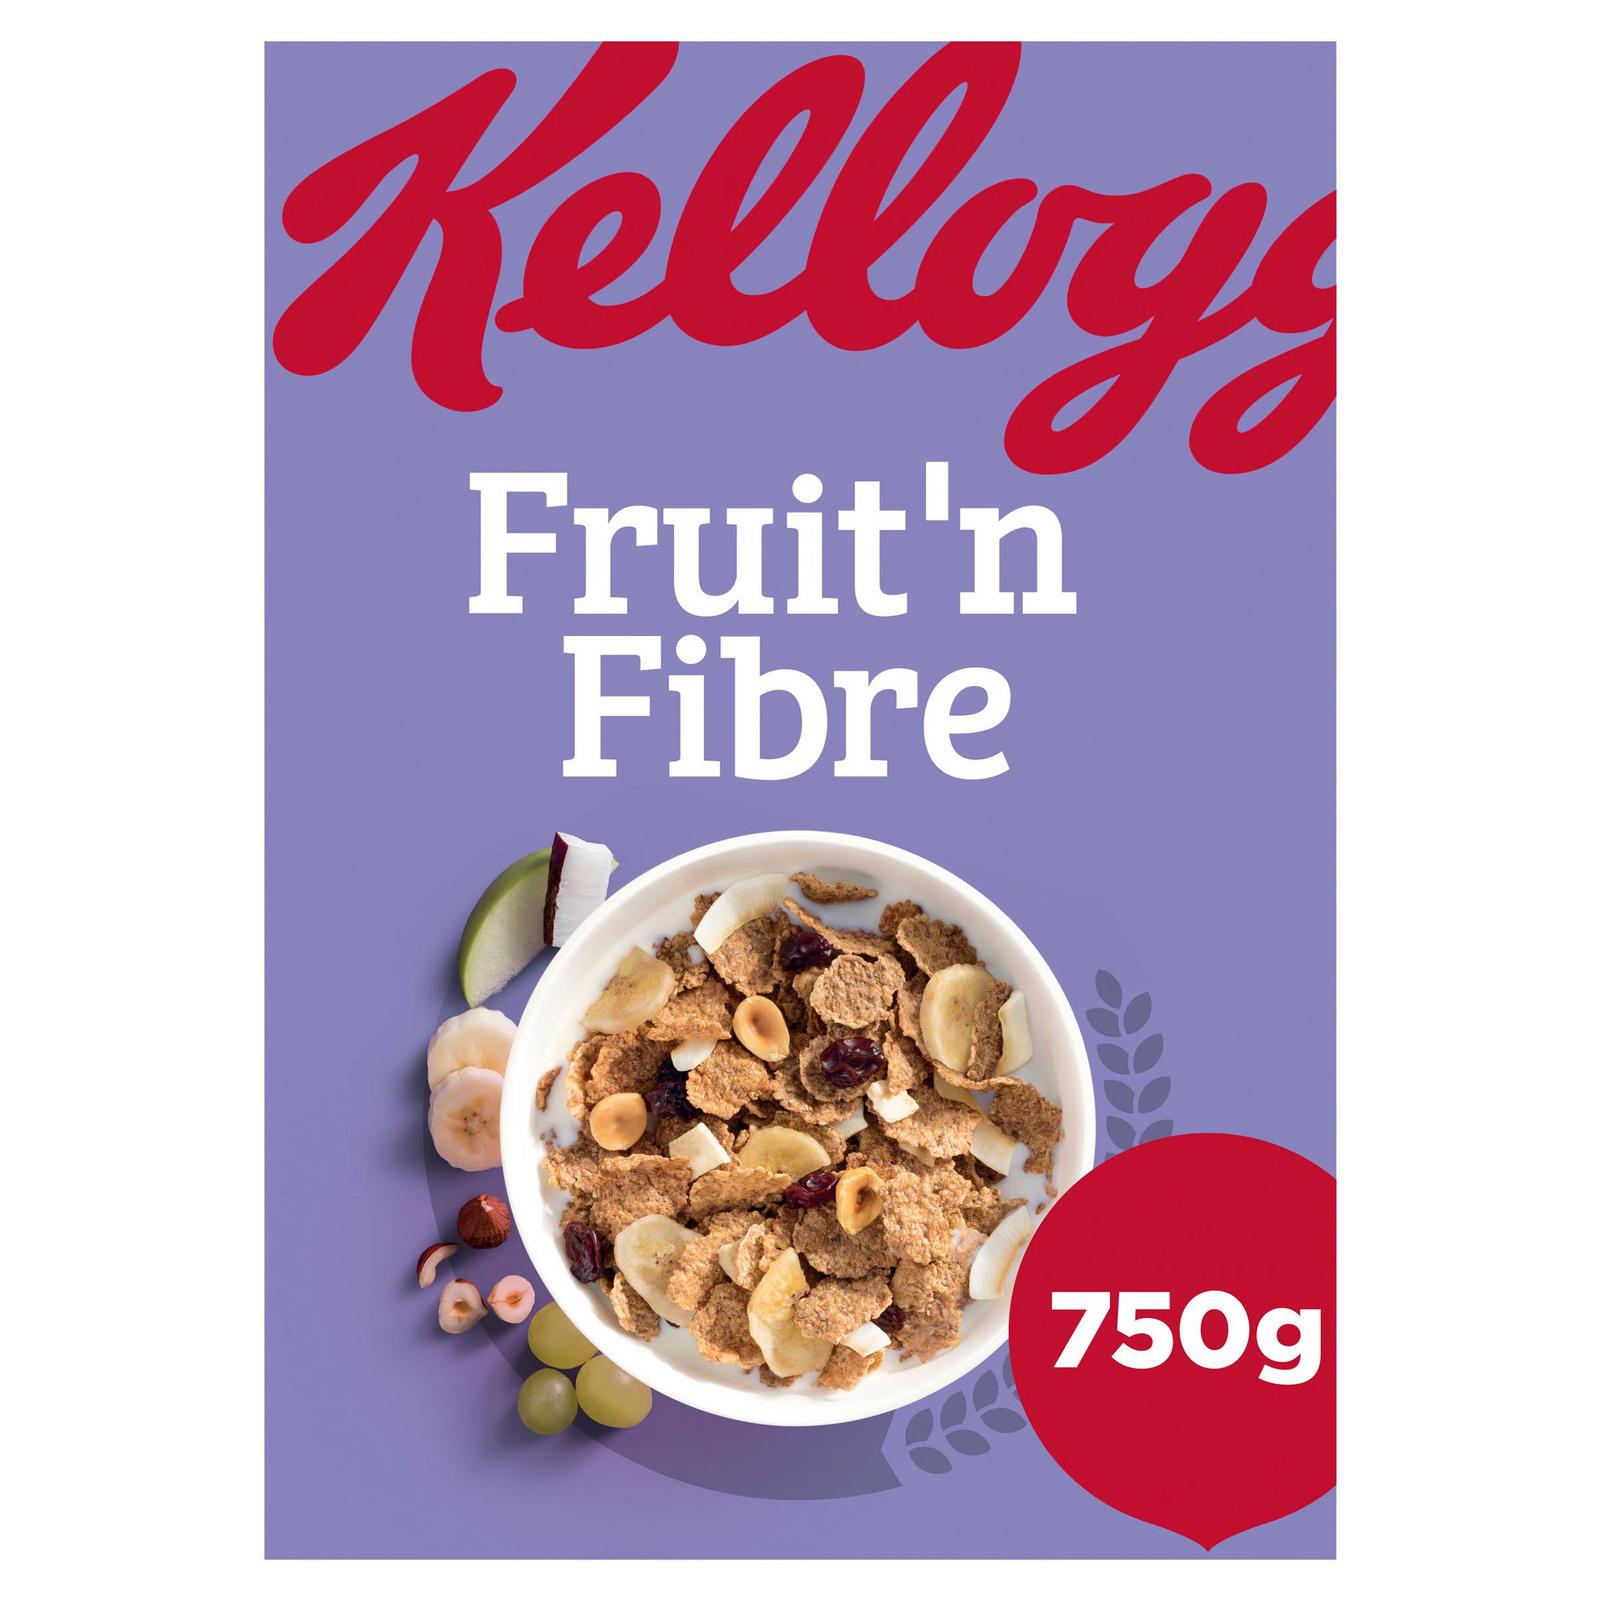 Kellogg's Fruit 'n Fibre Cereal 750g